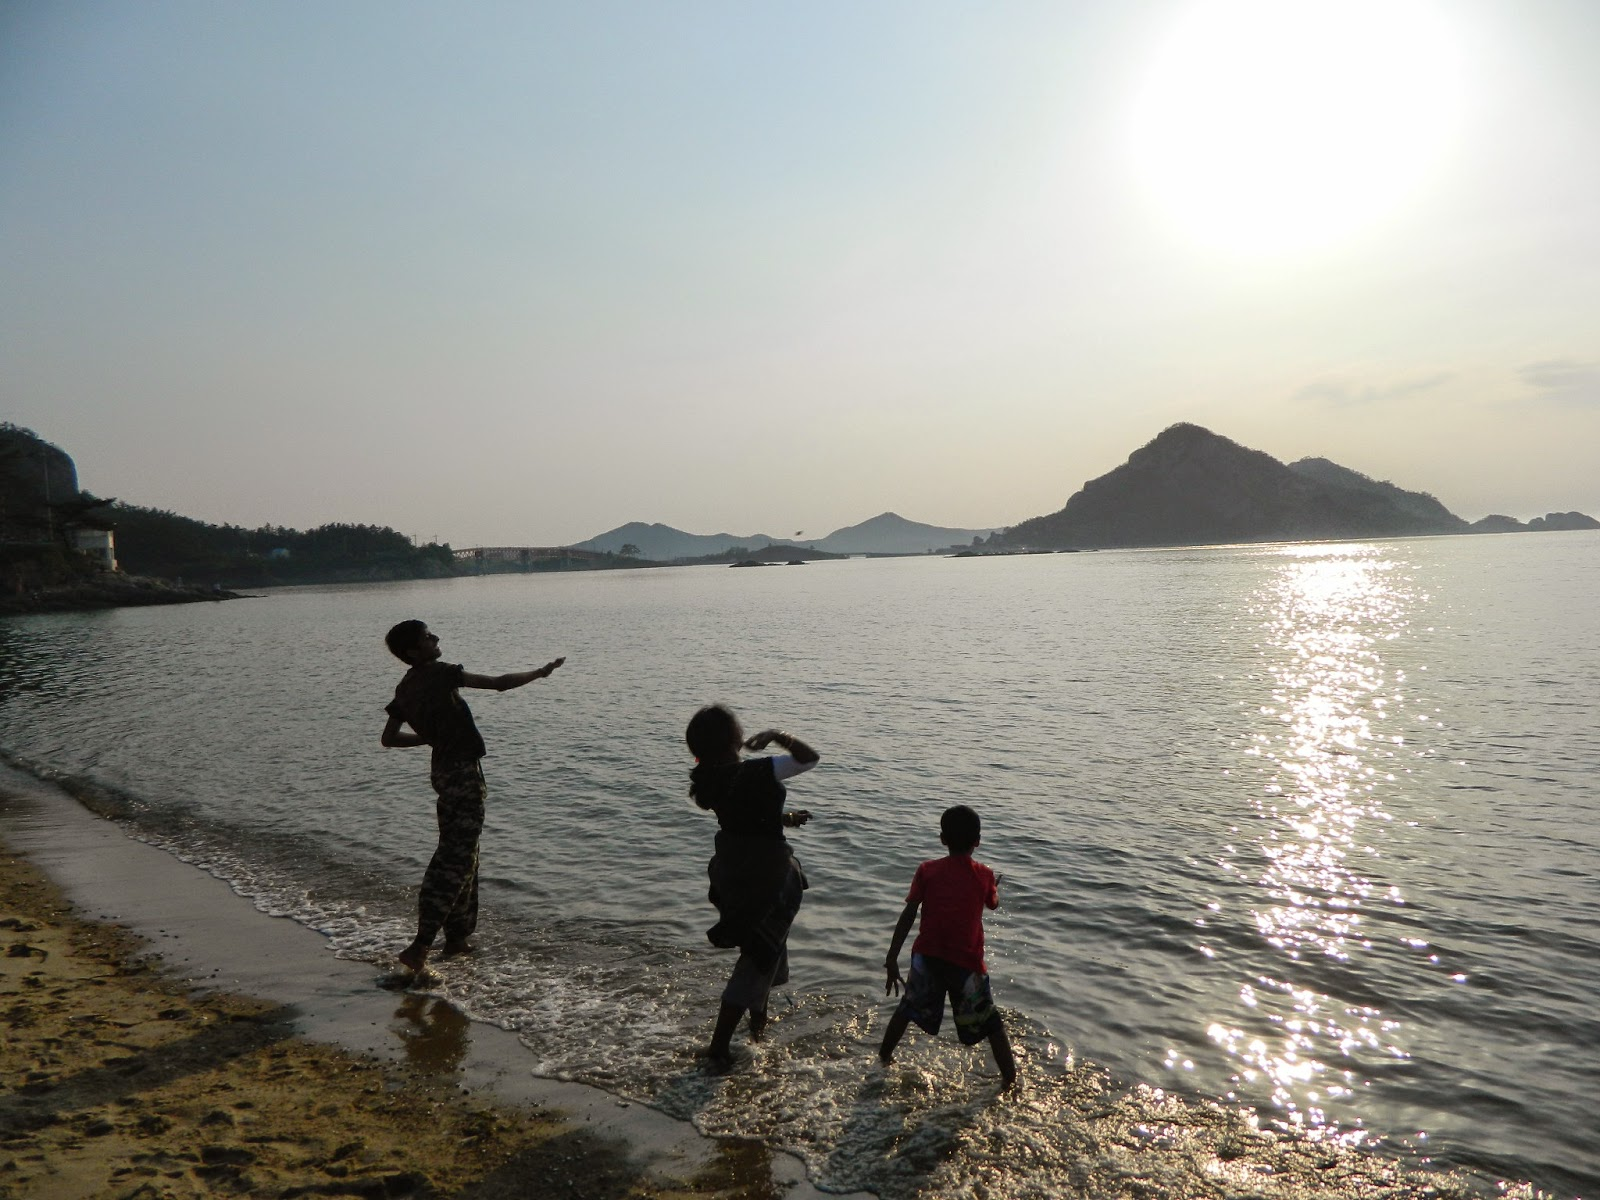 Playful times in Jeju beach